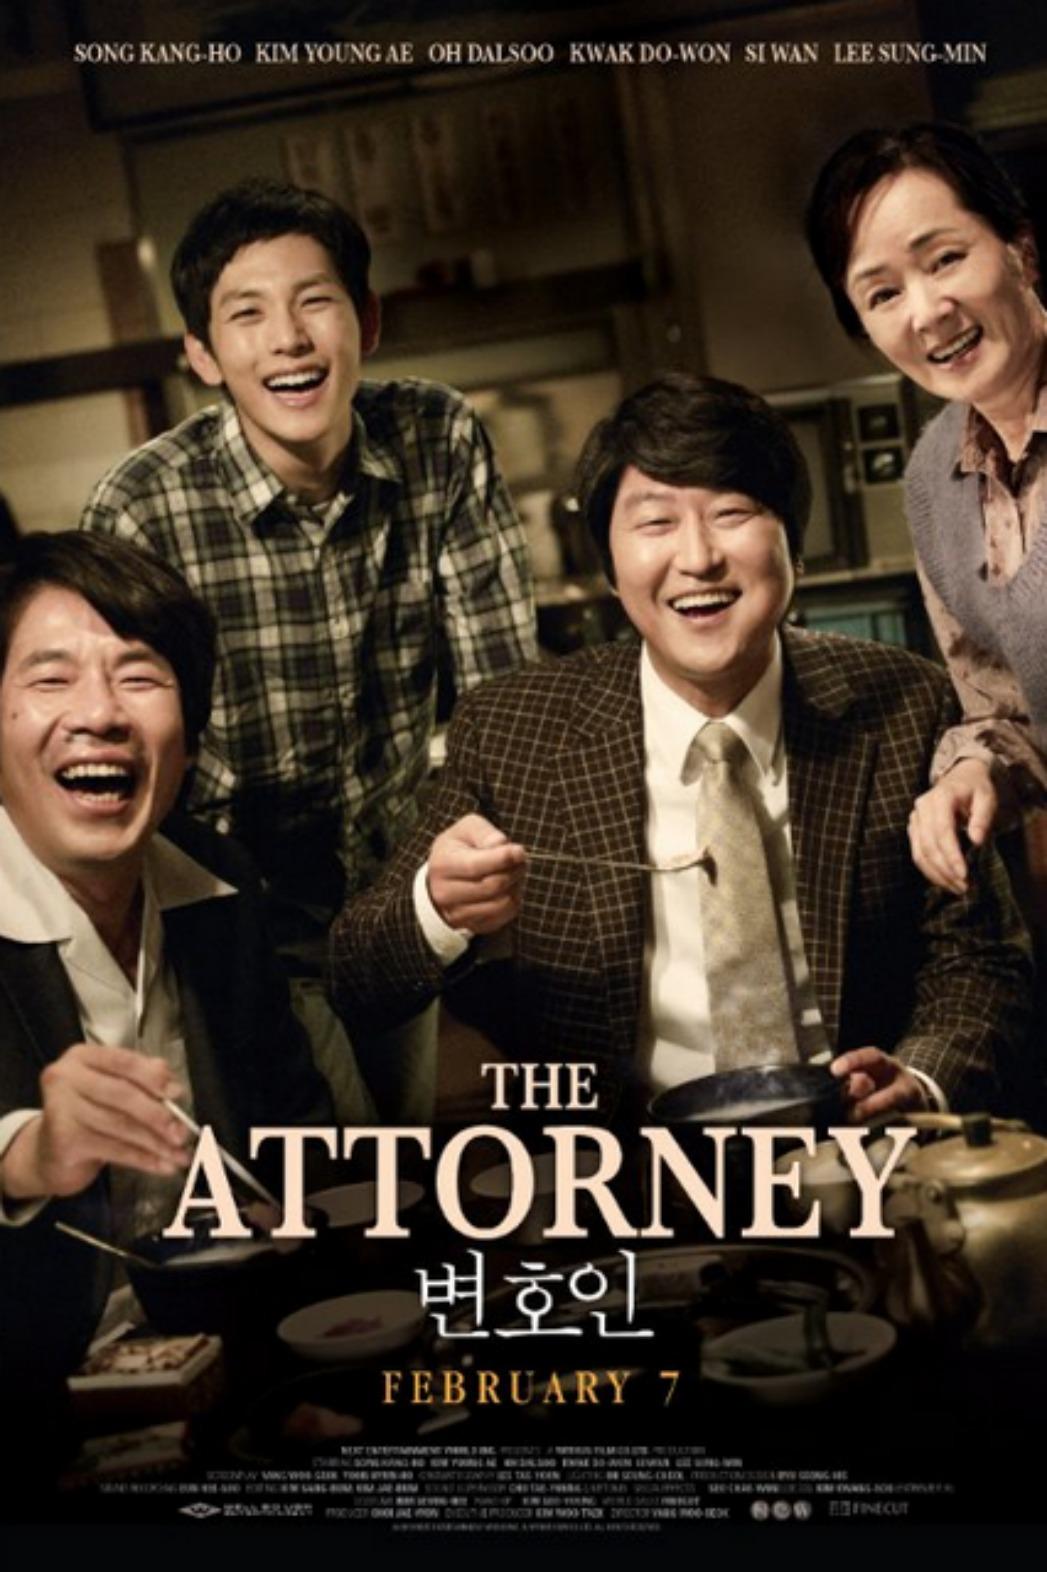 The Attorney - P - 2014